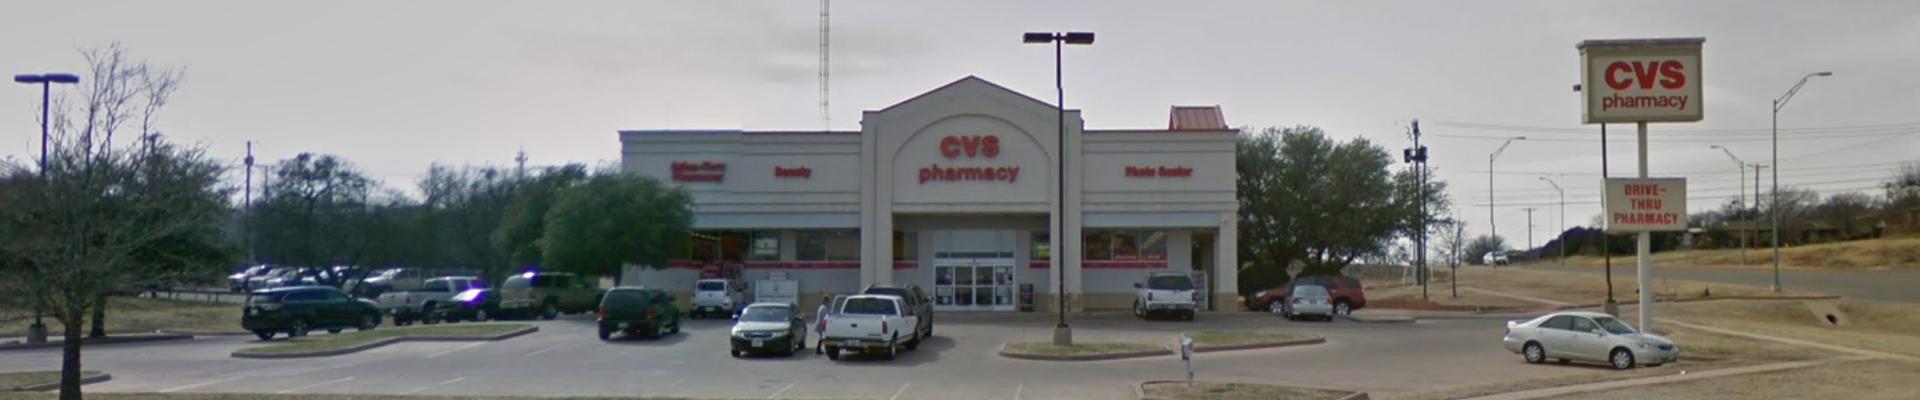 CVS - Wichita Falls, Texas